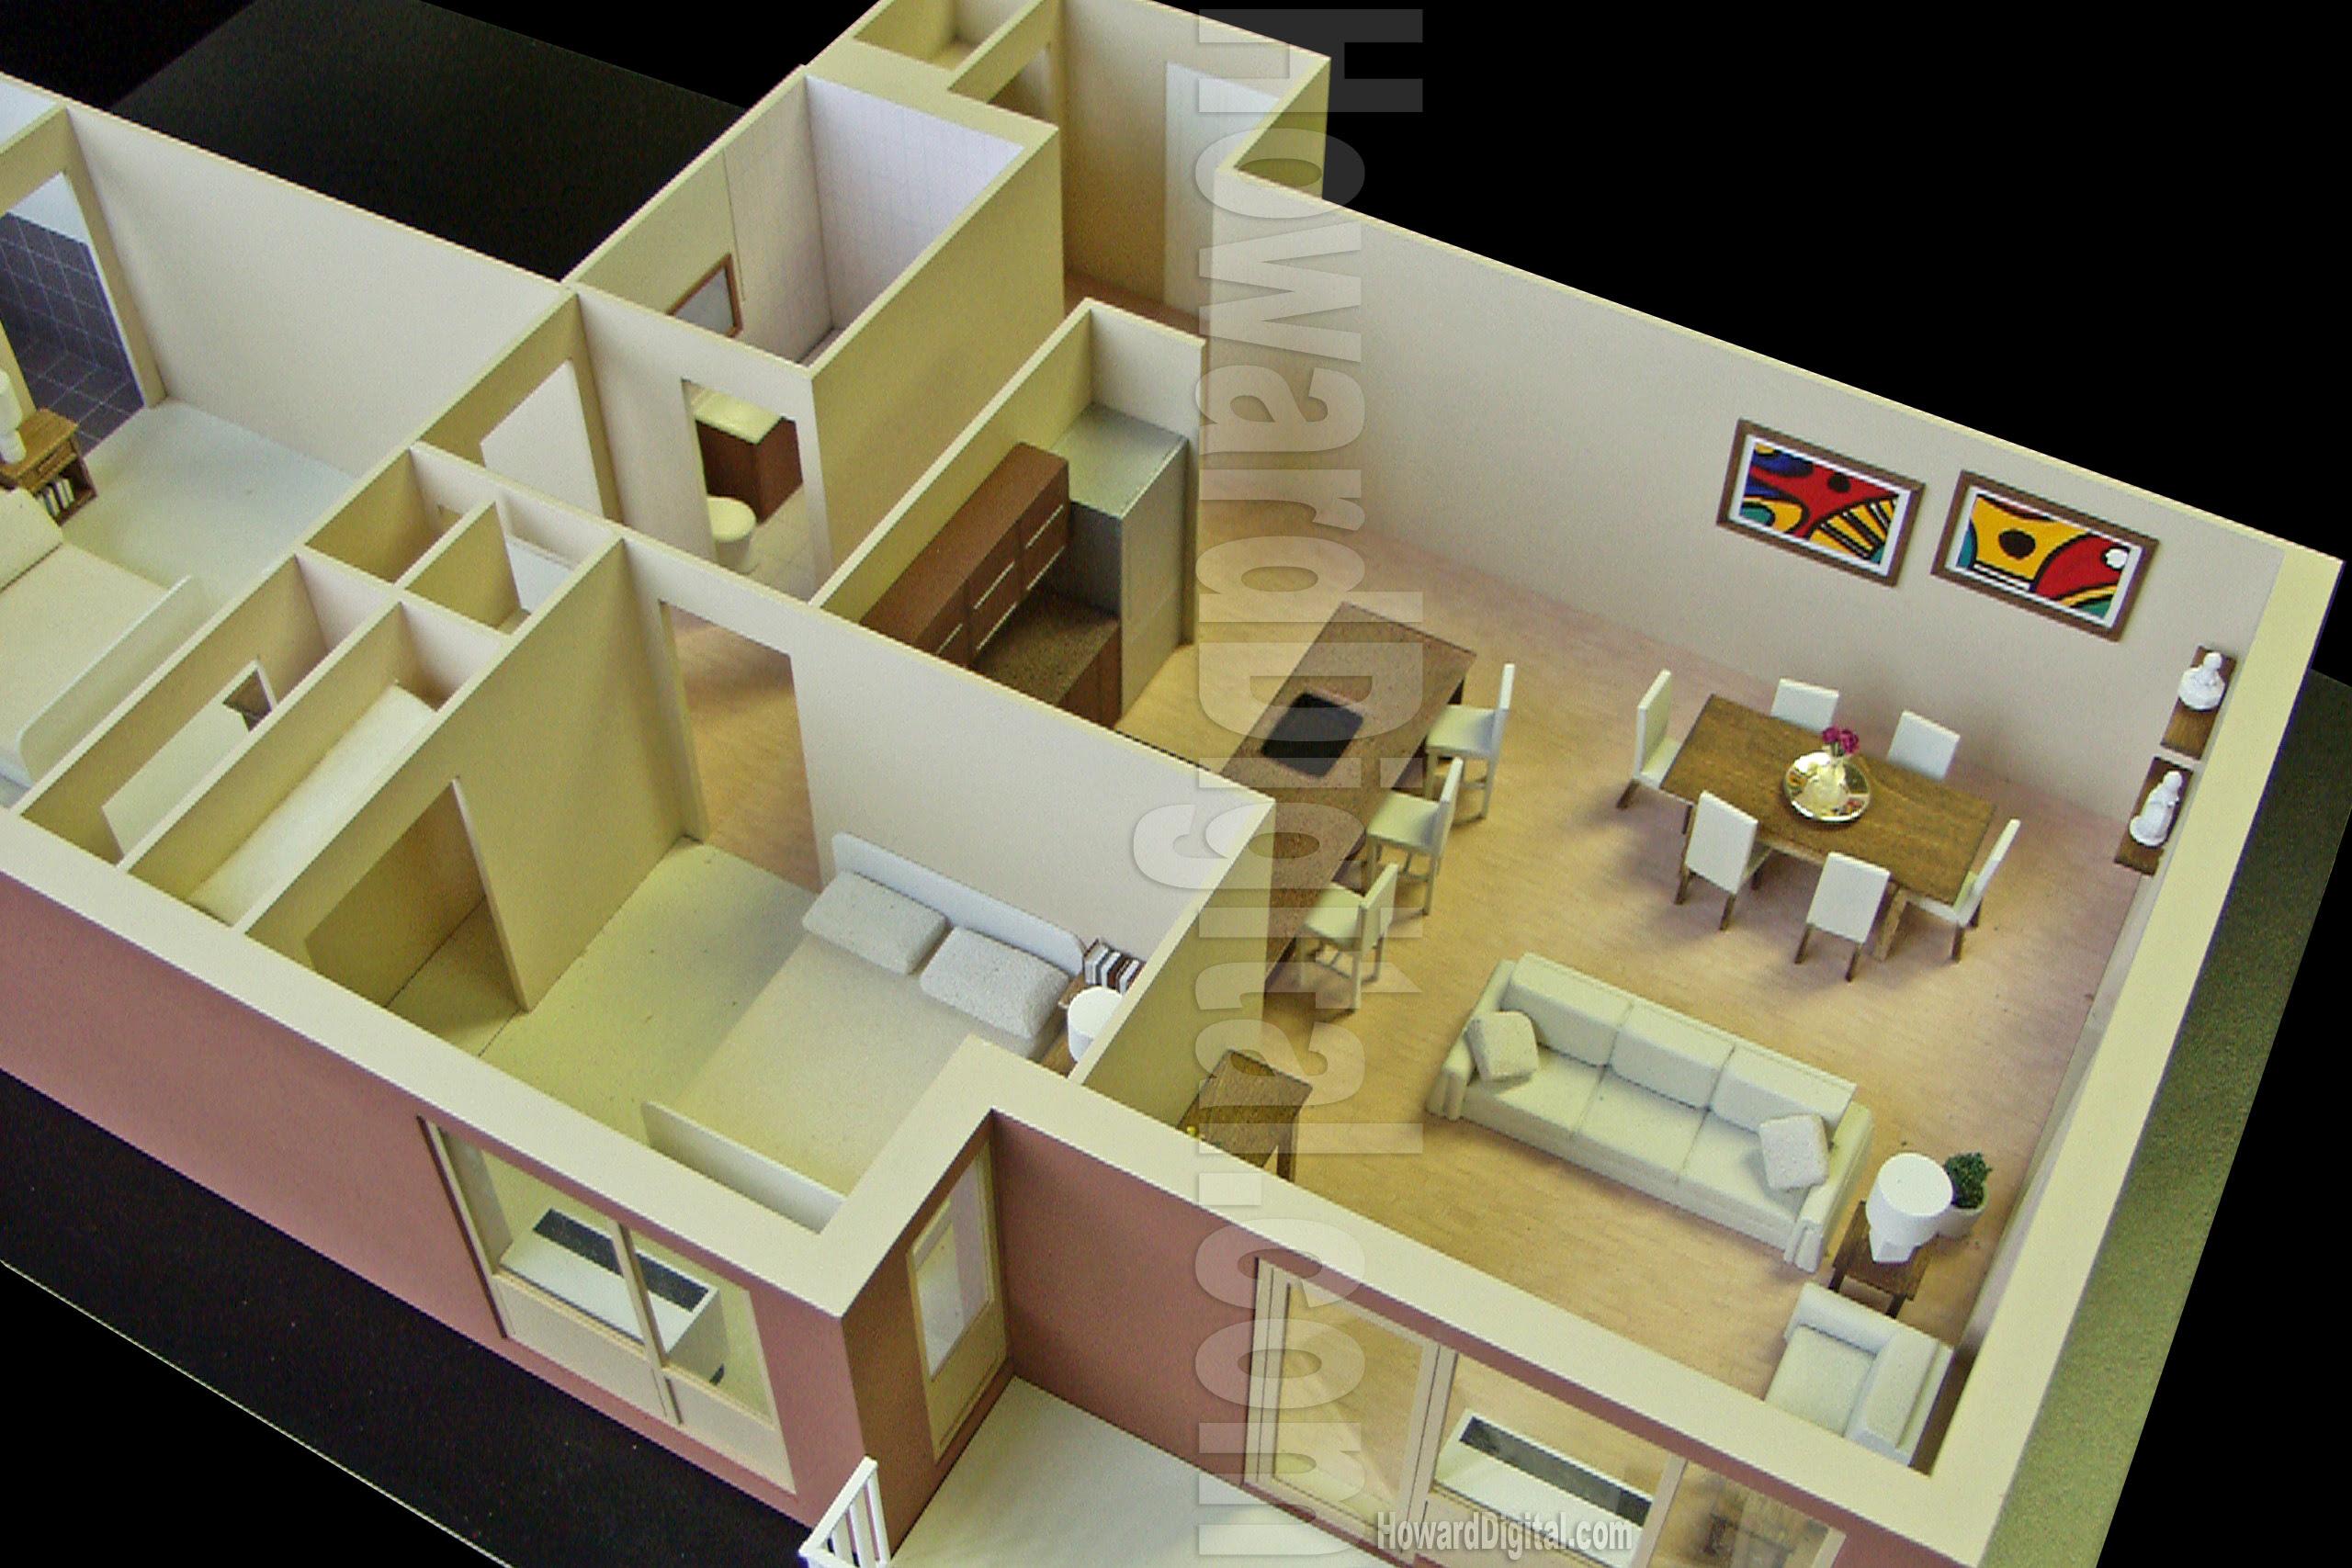 view source more home interior design model interiors - House Design Model